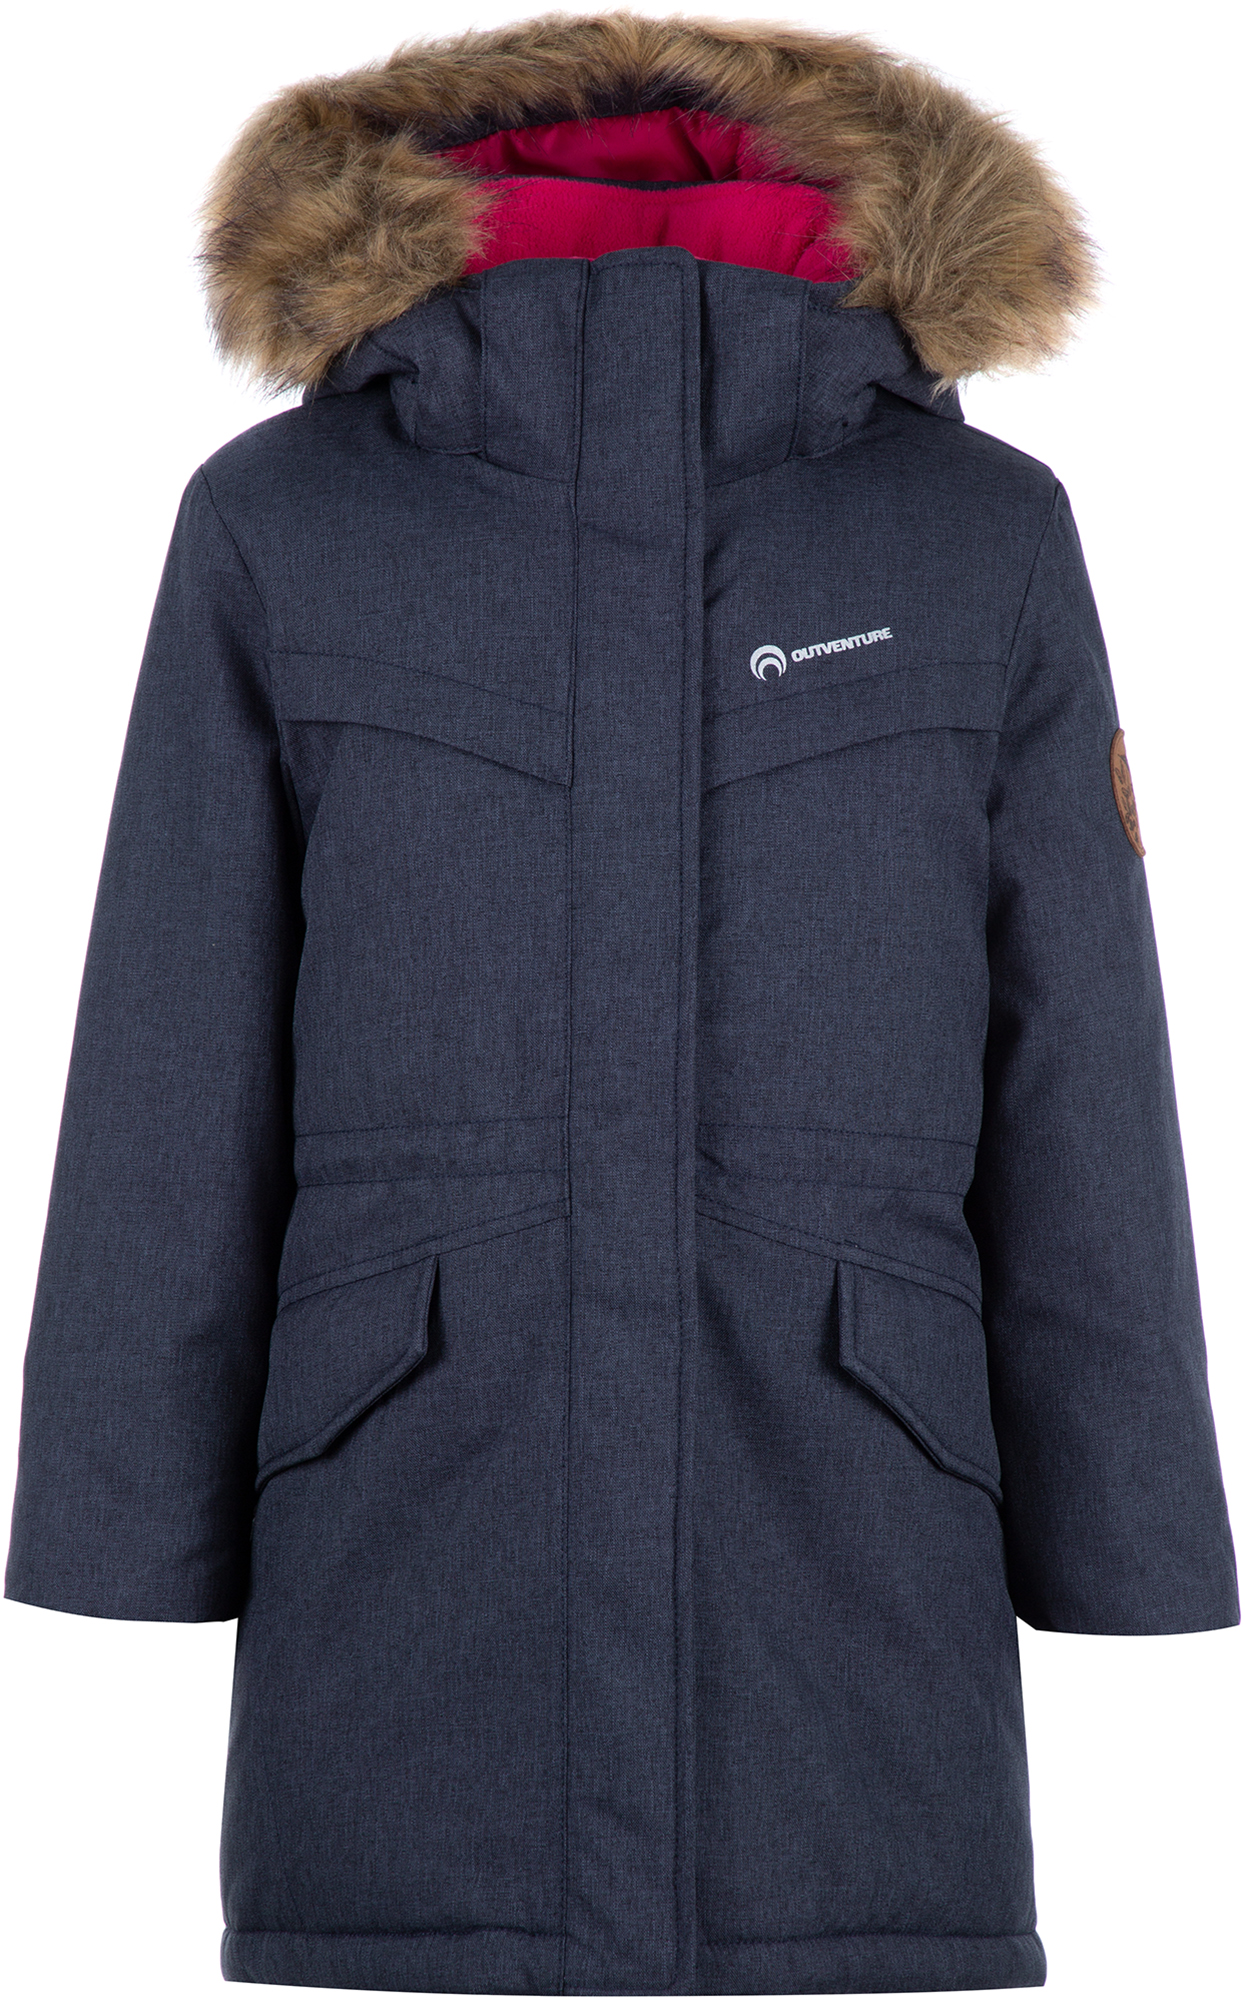 Outventure Куртка утепленная для девочек Outventure, размер 122